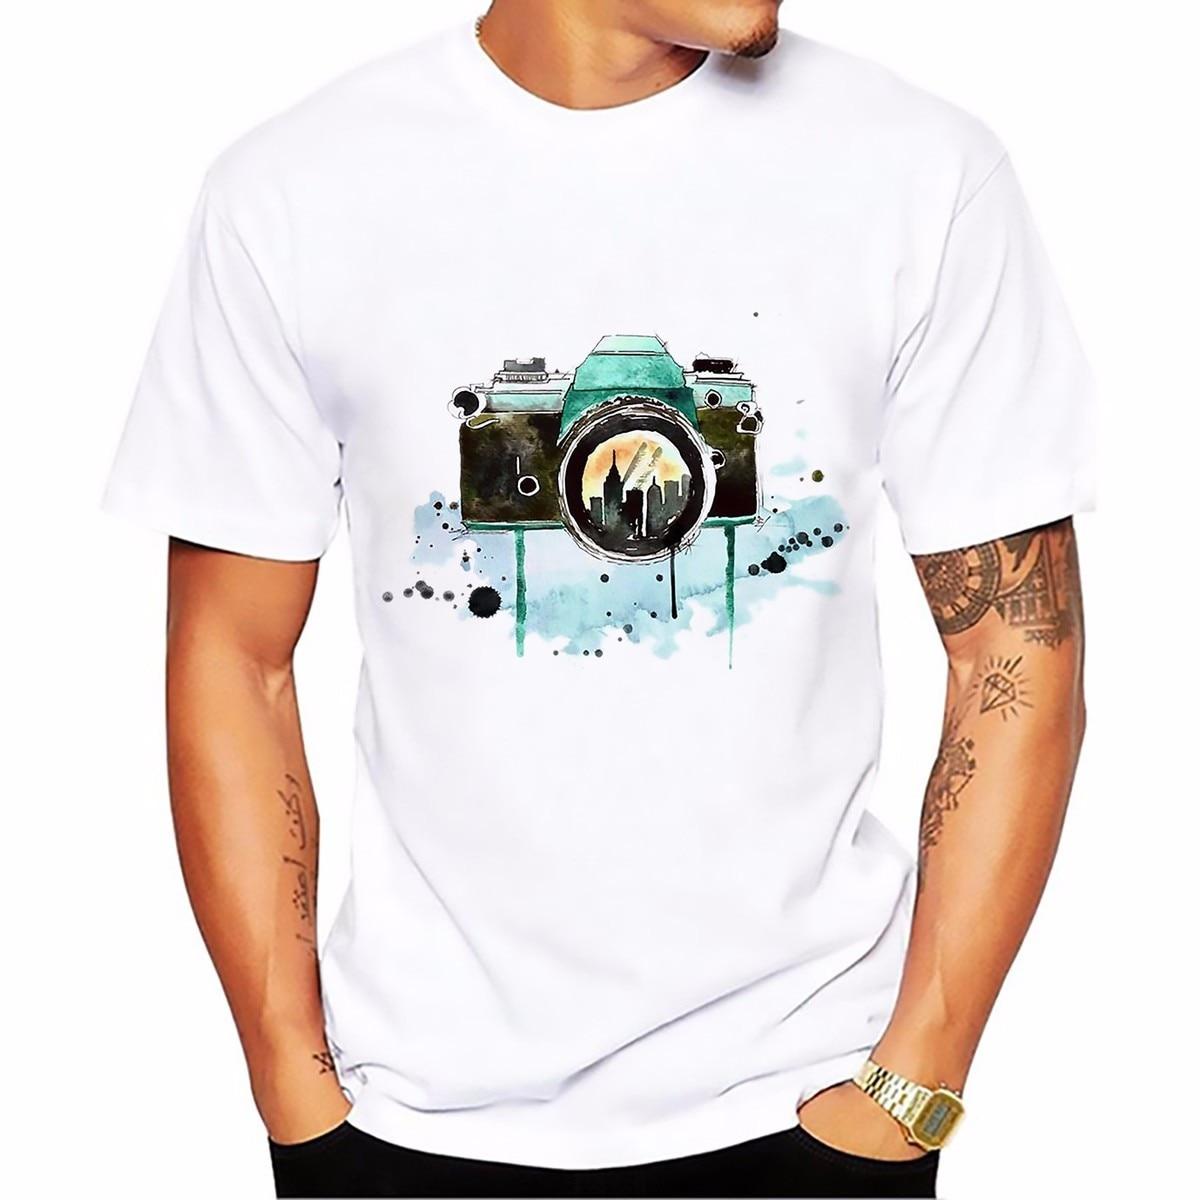 Fresh Style Camera Design T Shirt Man Summer Tops Tees